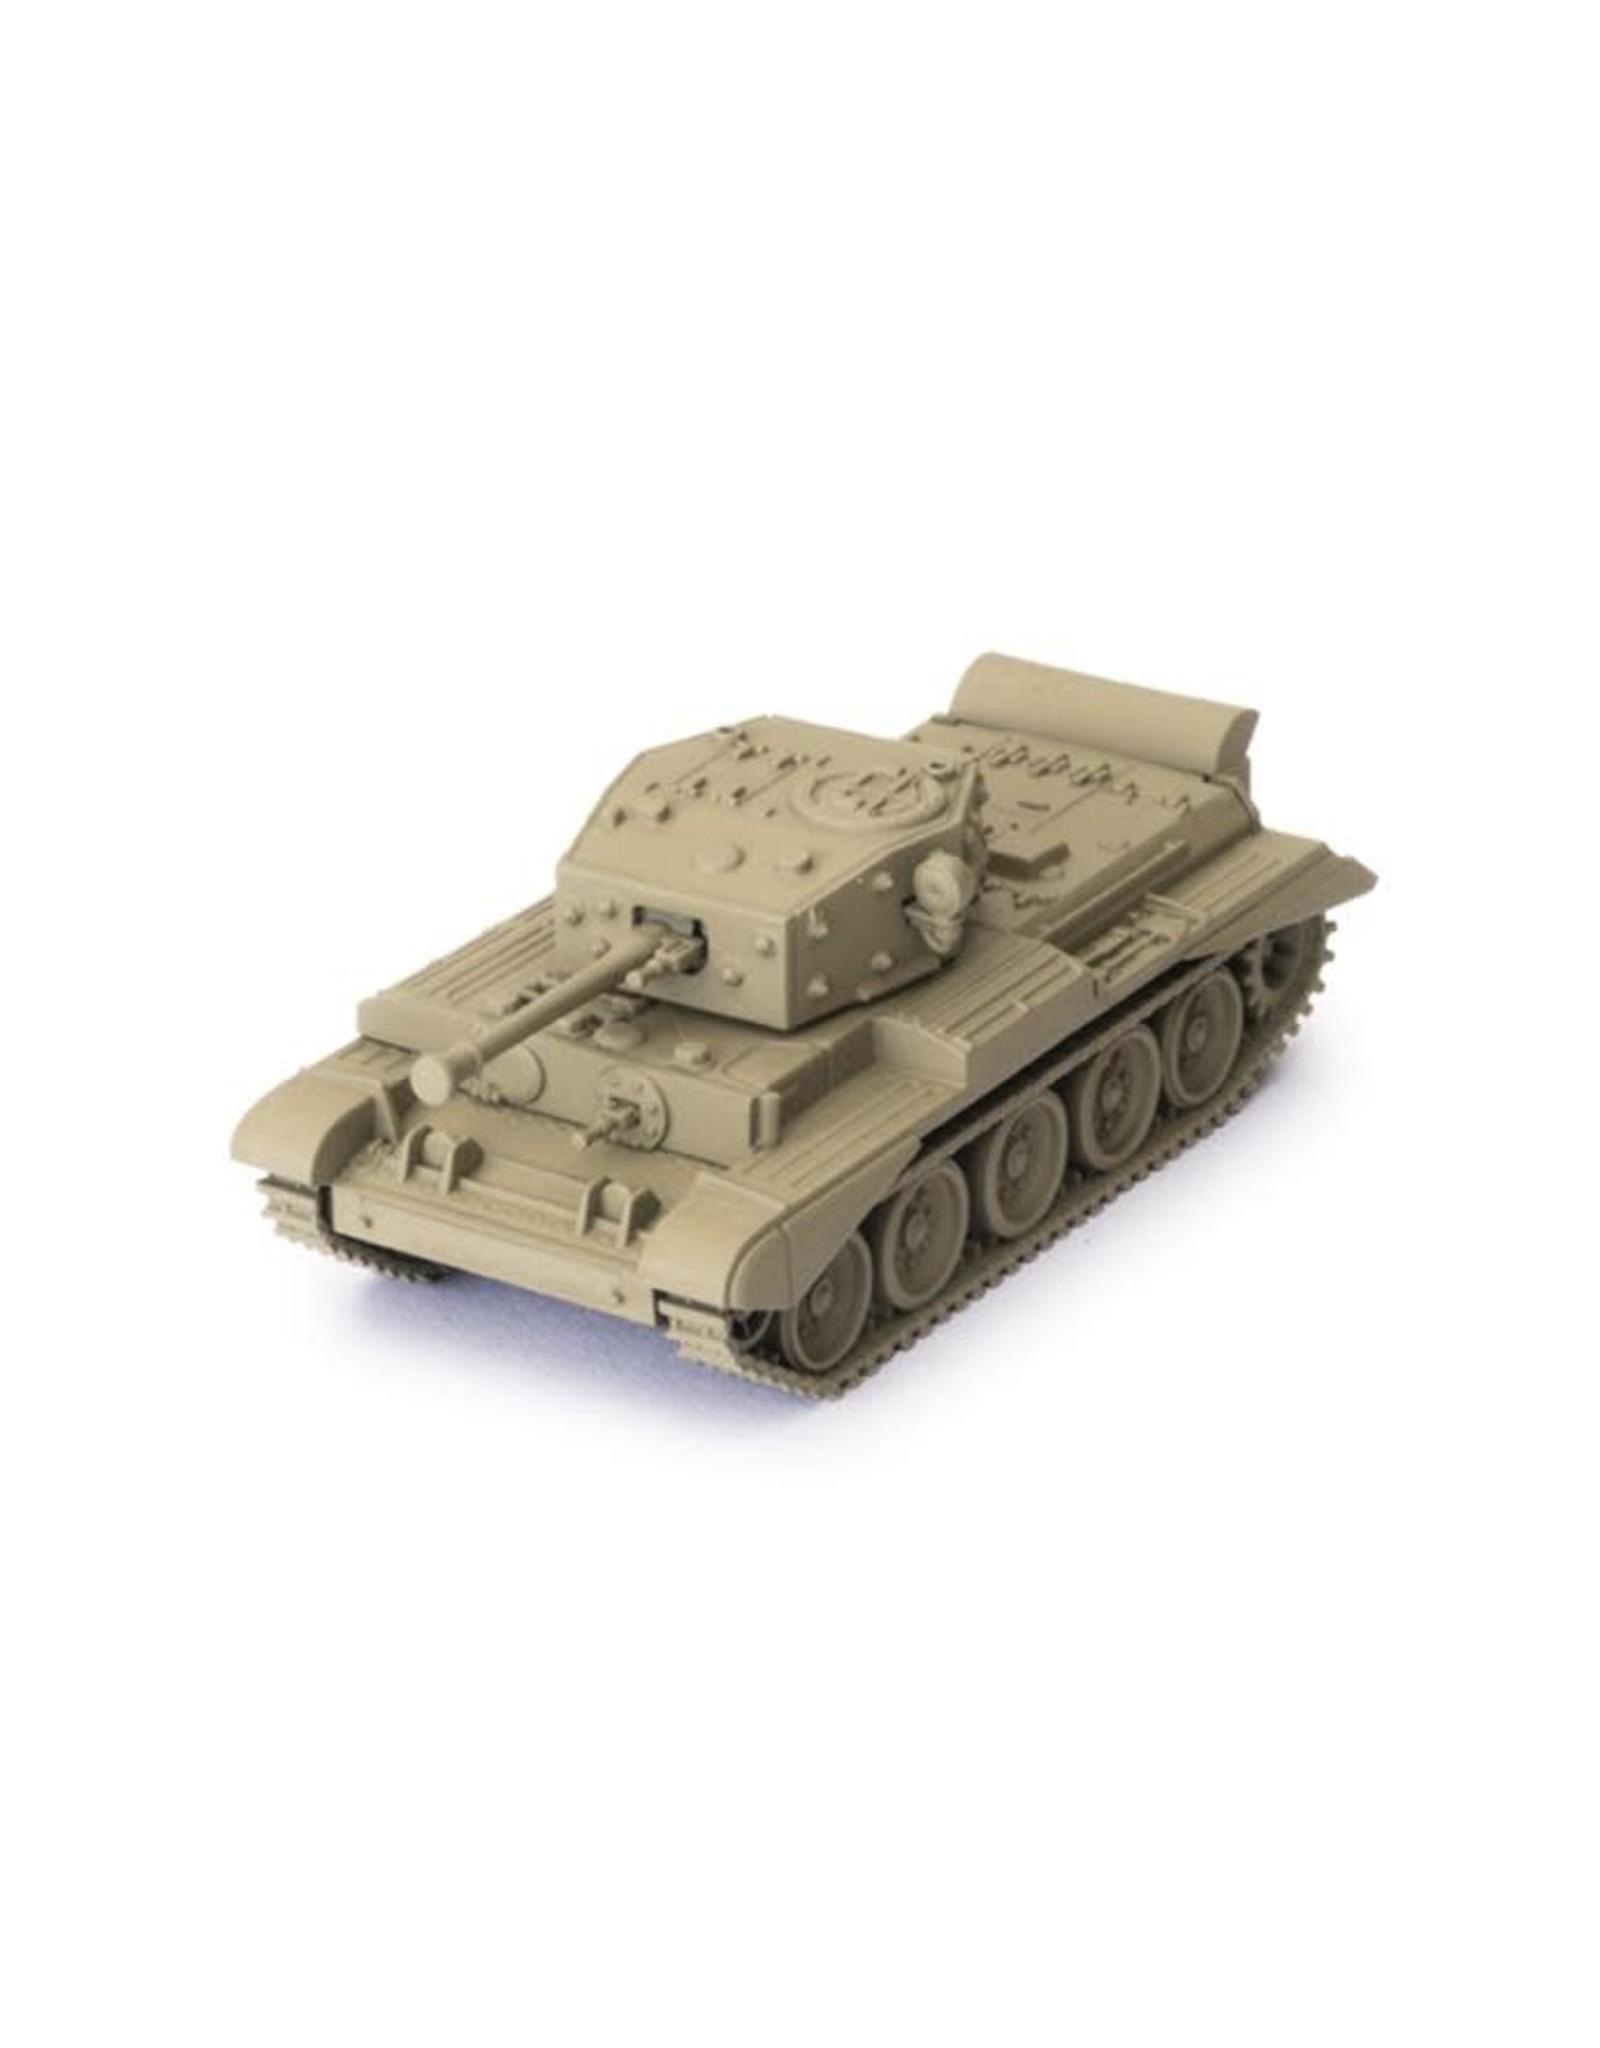 GaleForce nine World of Tanks Expansion - British (Cromwell)